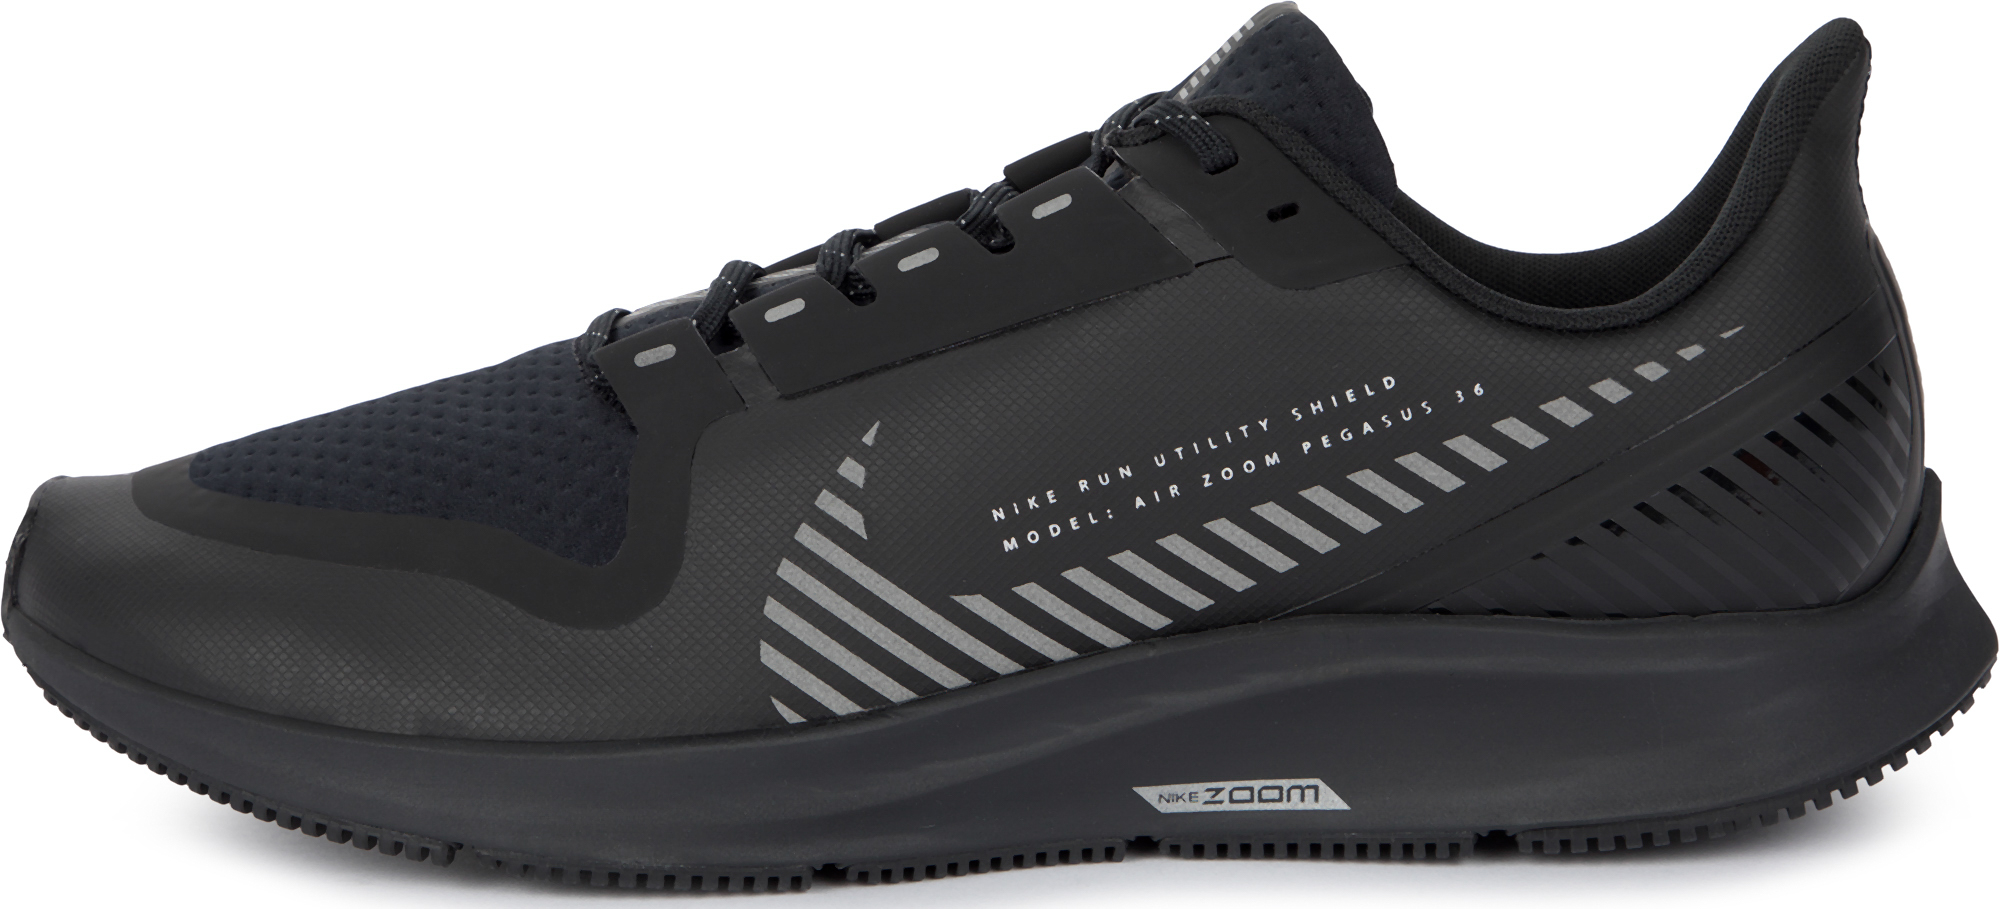 Nike Кроссовки мужские Zoom Pegasus 36 Shield, размер 46,5